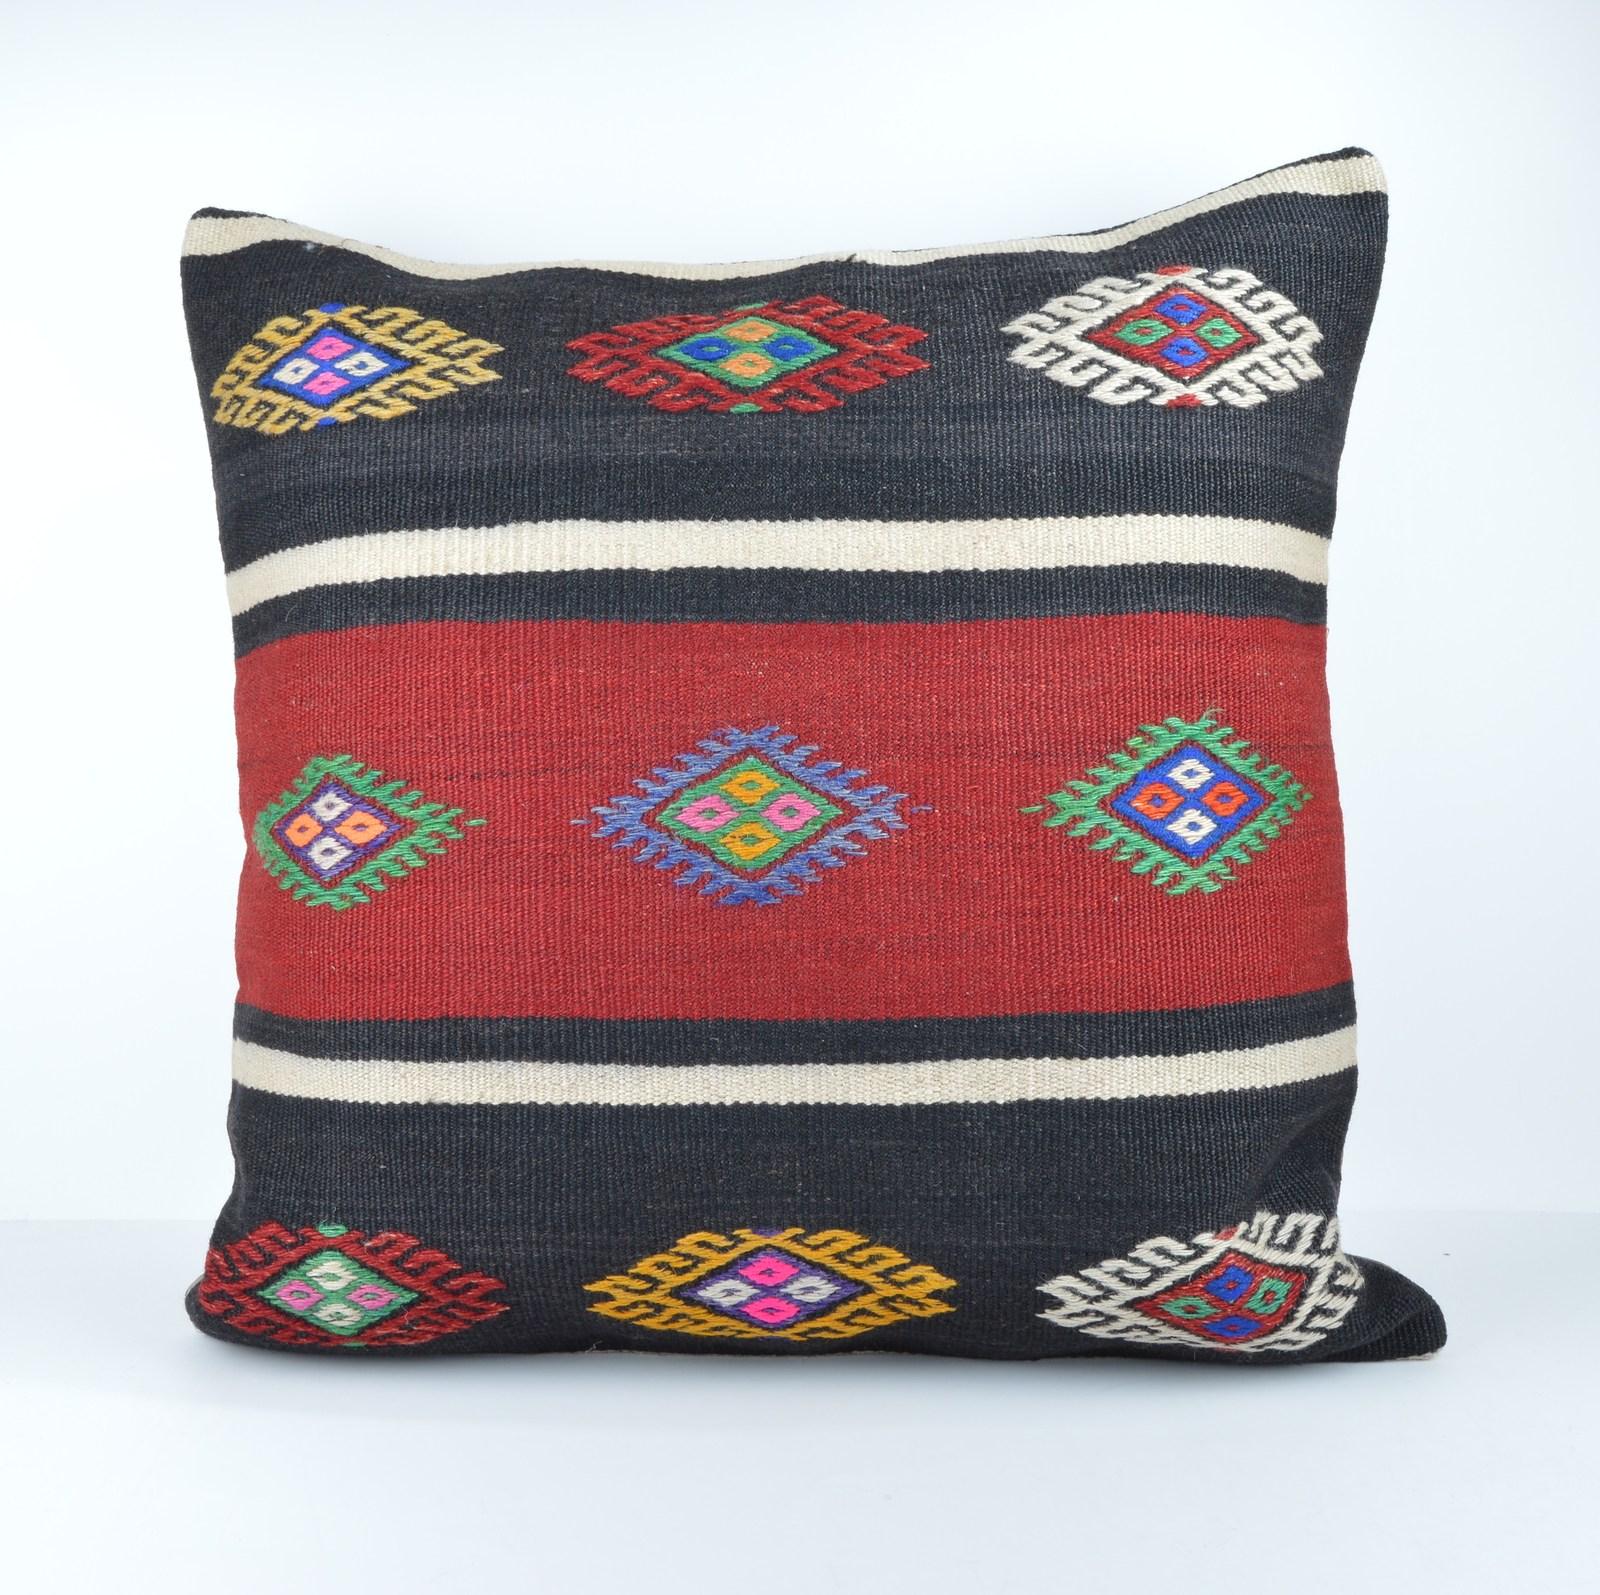 Very Large Decorative Pillows : 24x24 inch pillow ,extra large pillow,european pillow,decorative pillow 24,large - Pillows